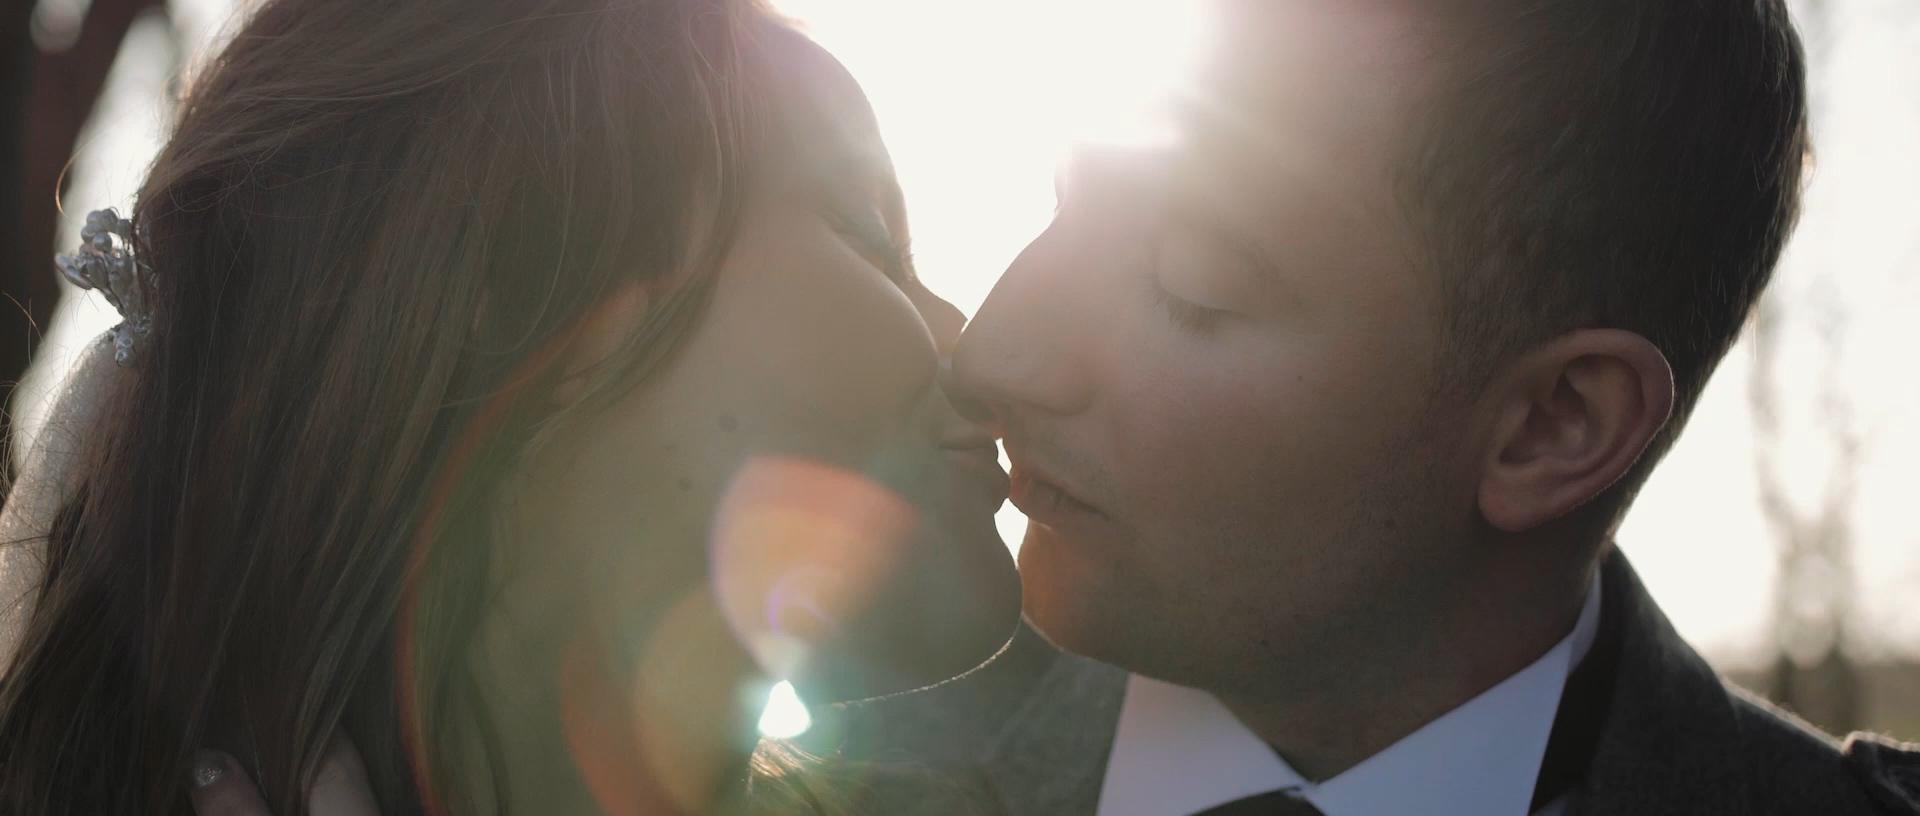 the-byre-at-inchyra-wedding-videographer_LL_03.jpg